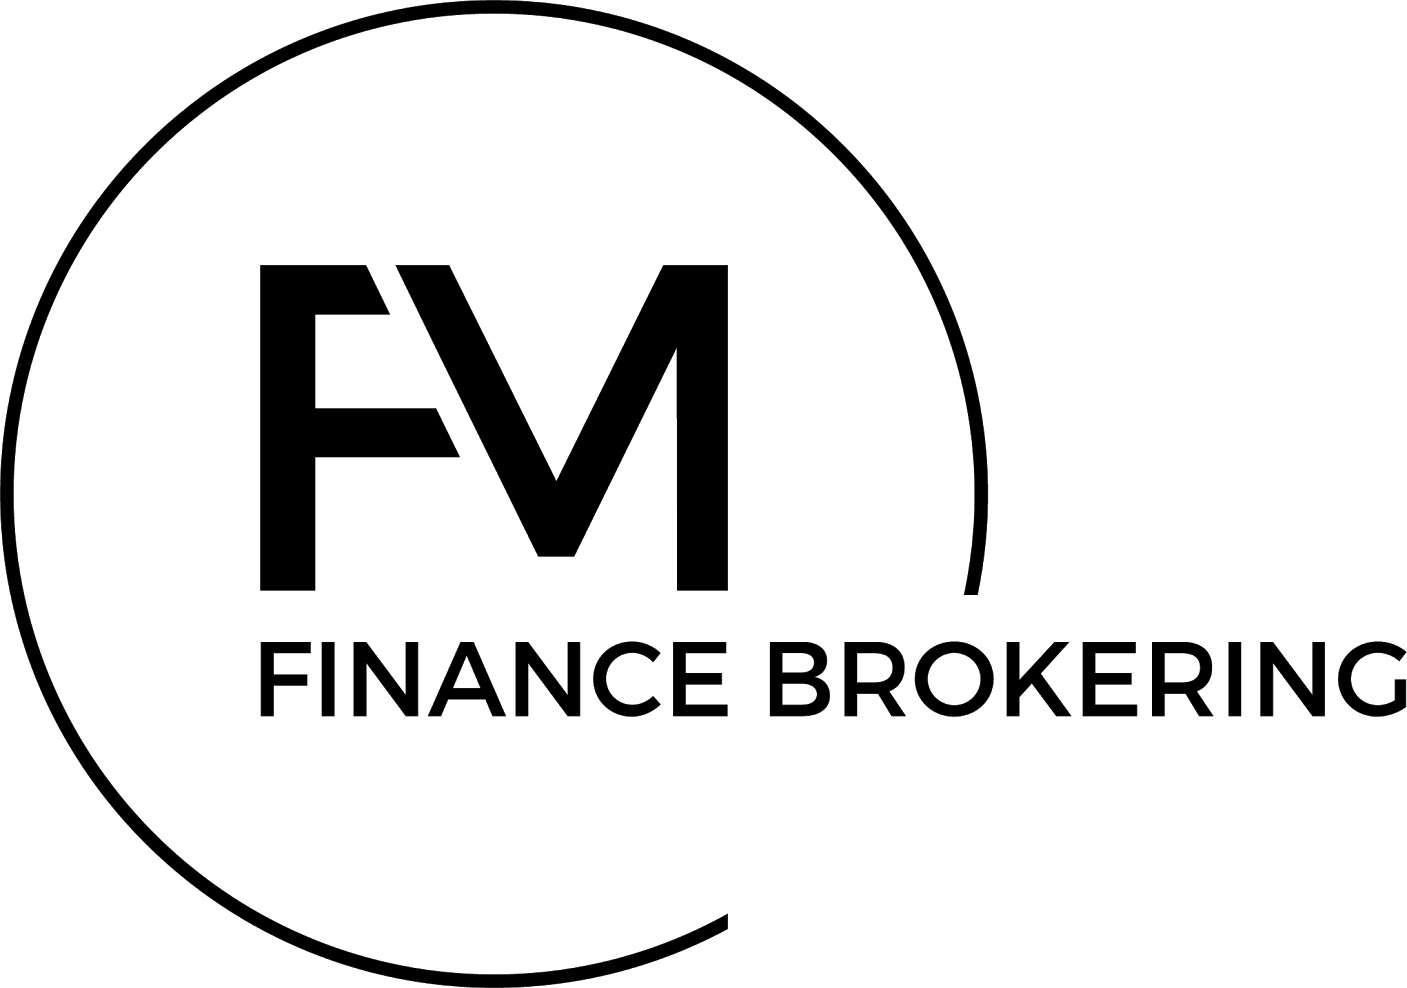 FM Finance